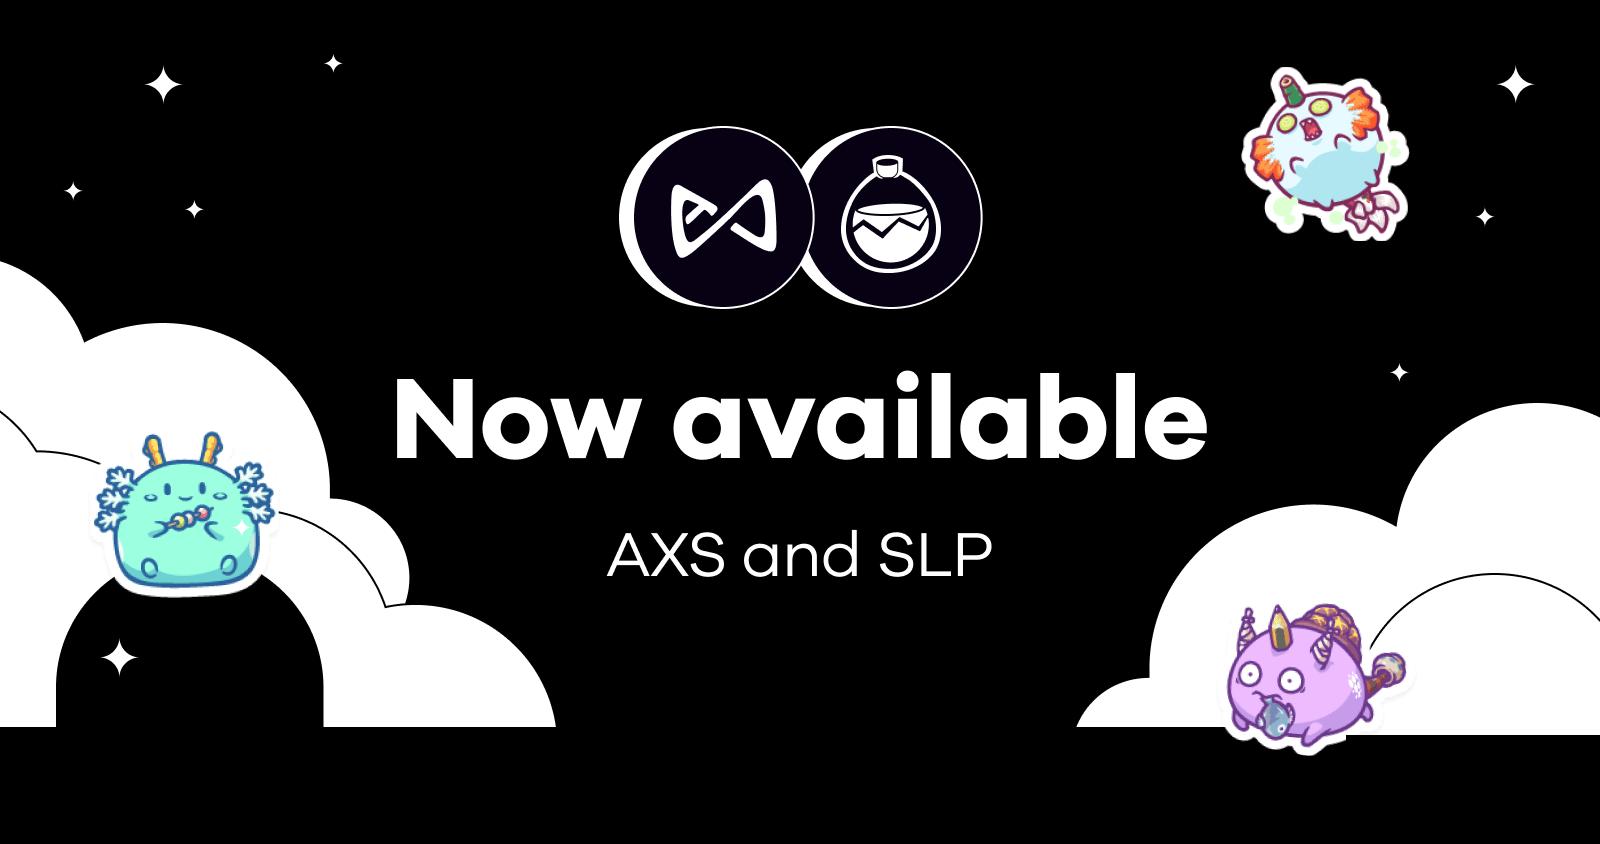 AXS_SLP Creative